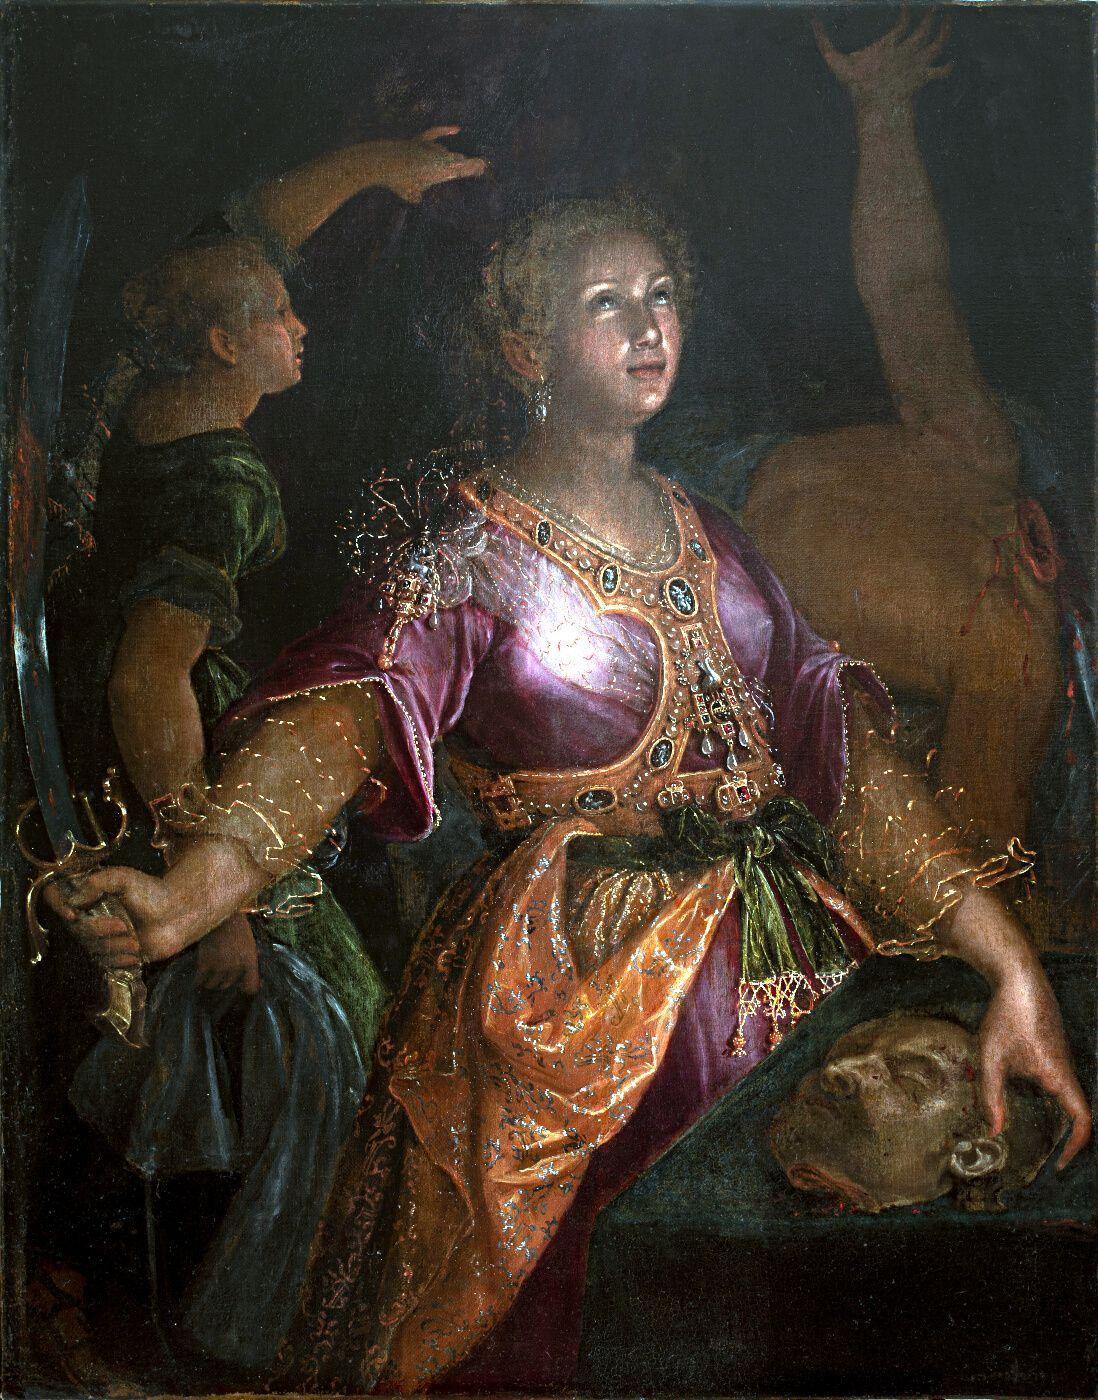 Judith y Holofernes. Lavinia Fontana